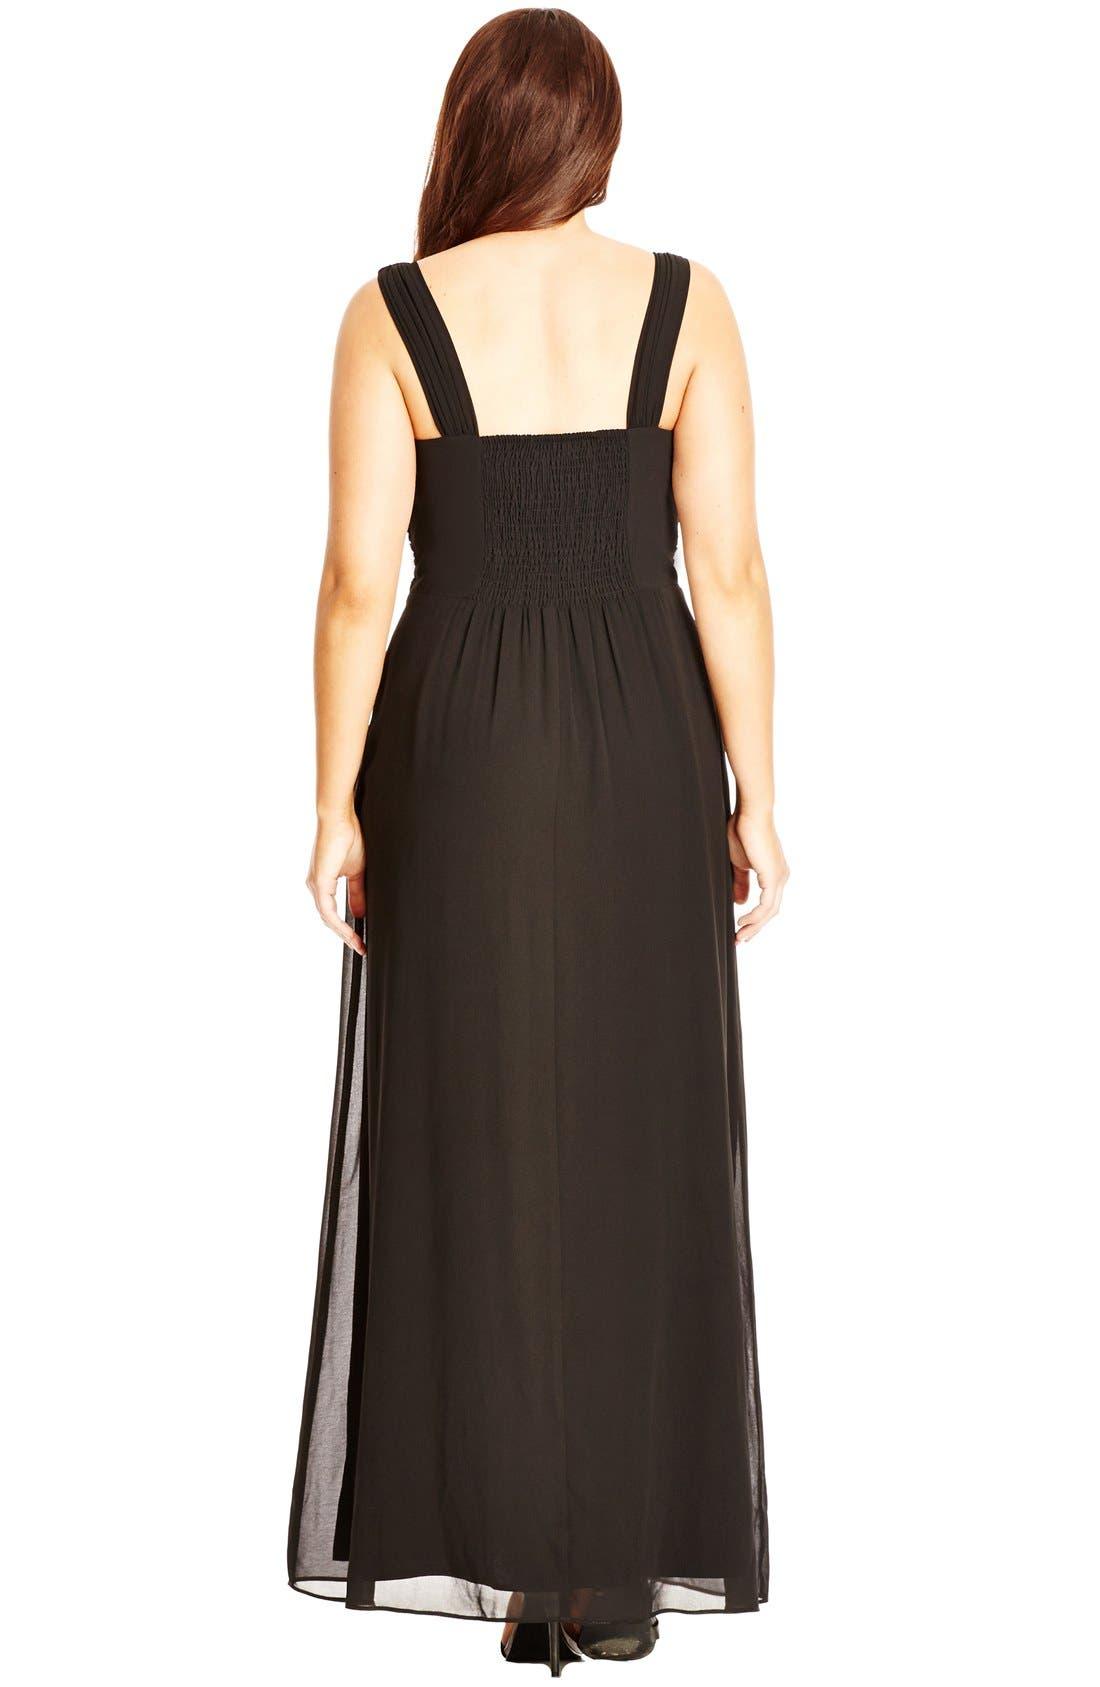 'Elegant Sparkle' Embellished Maxi Dress,                             Alternate thumbnail 3, color,                             Black